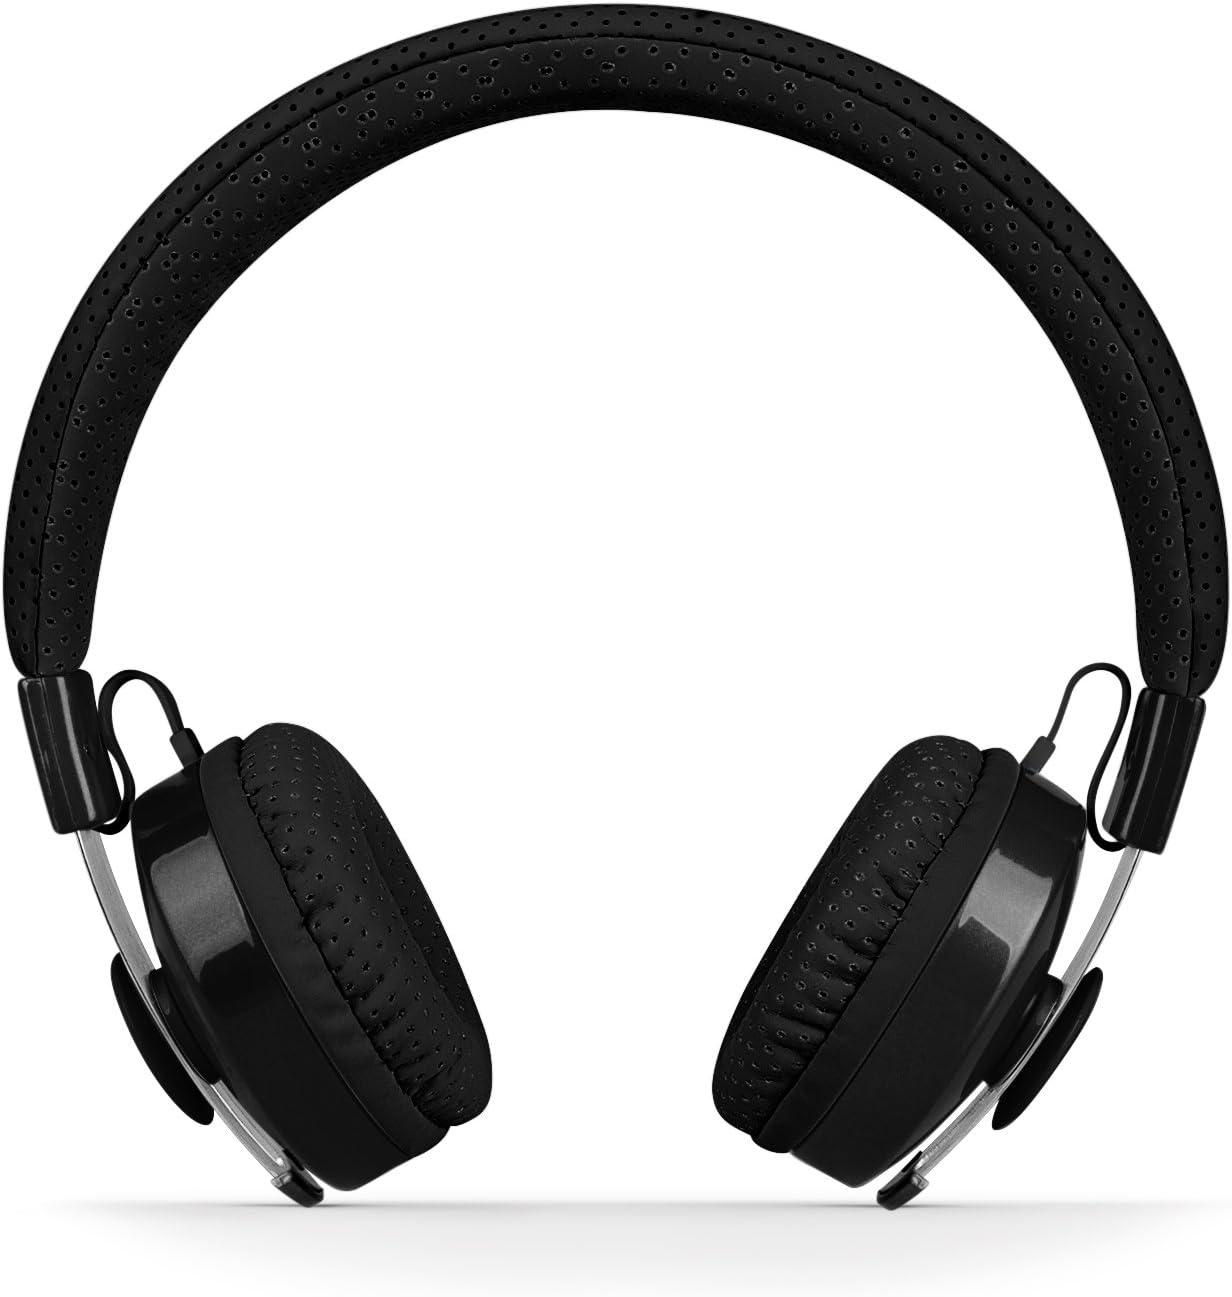 LilGadgets Untangled Pro Premium Children's Wireless Bluetooth Headphones with SharePort - Black